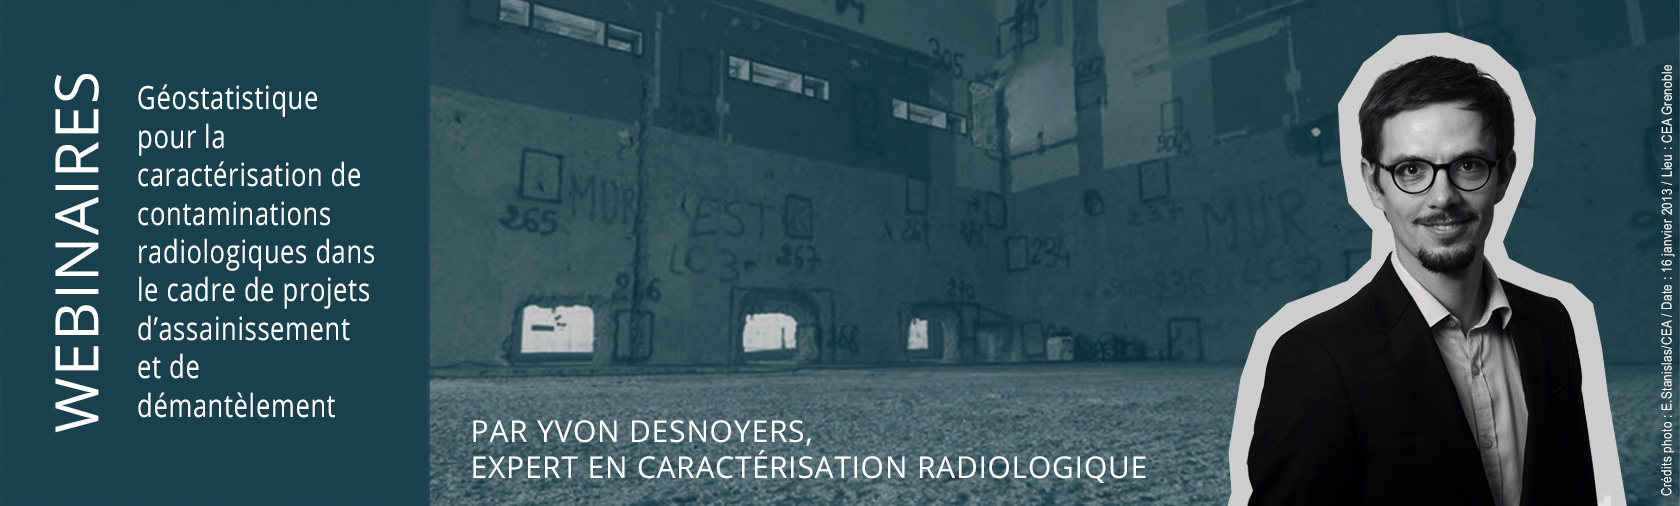 Sampling strategy for radioactive contamination characterization